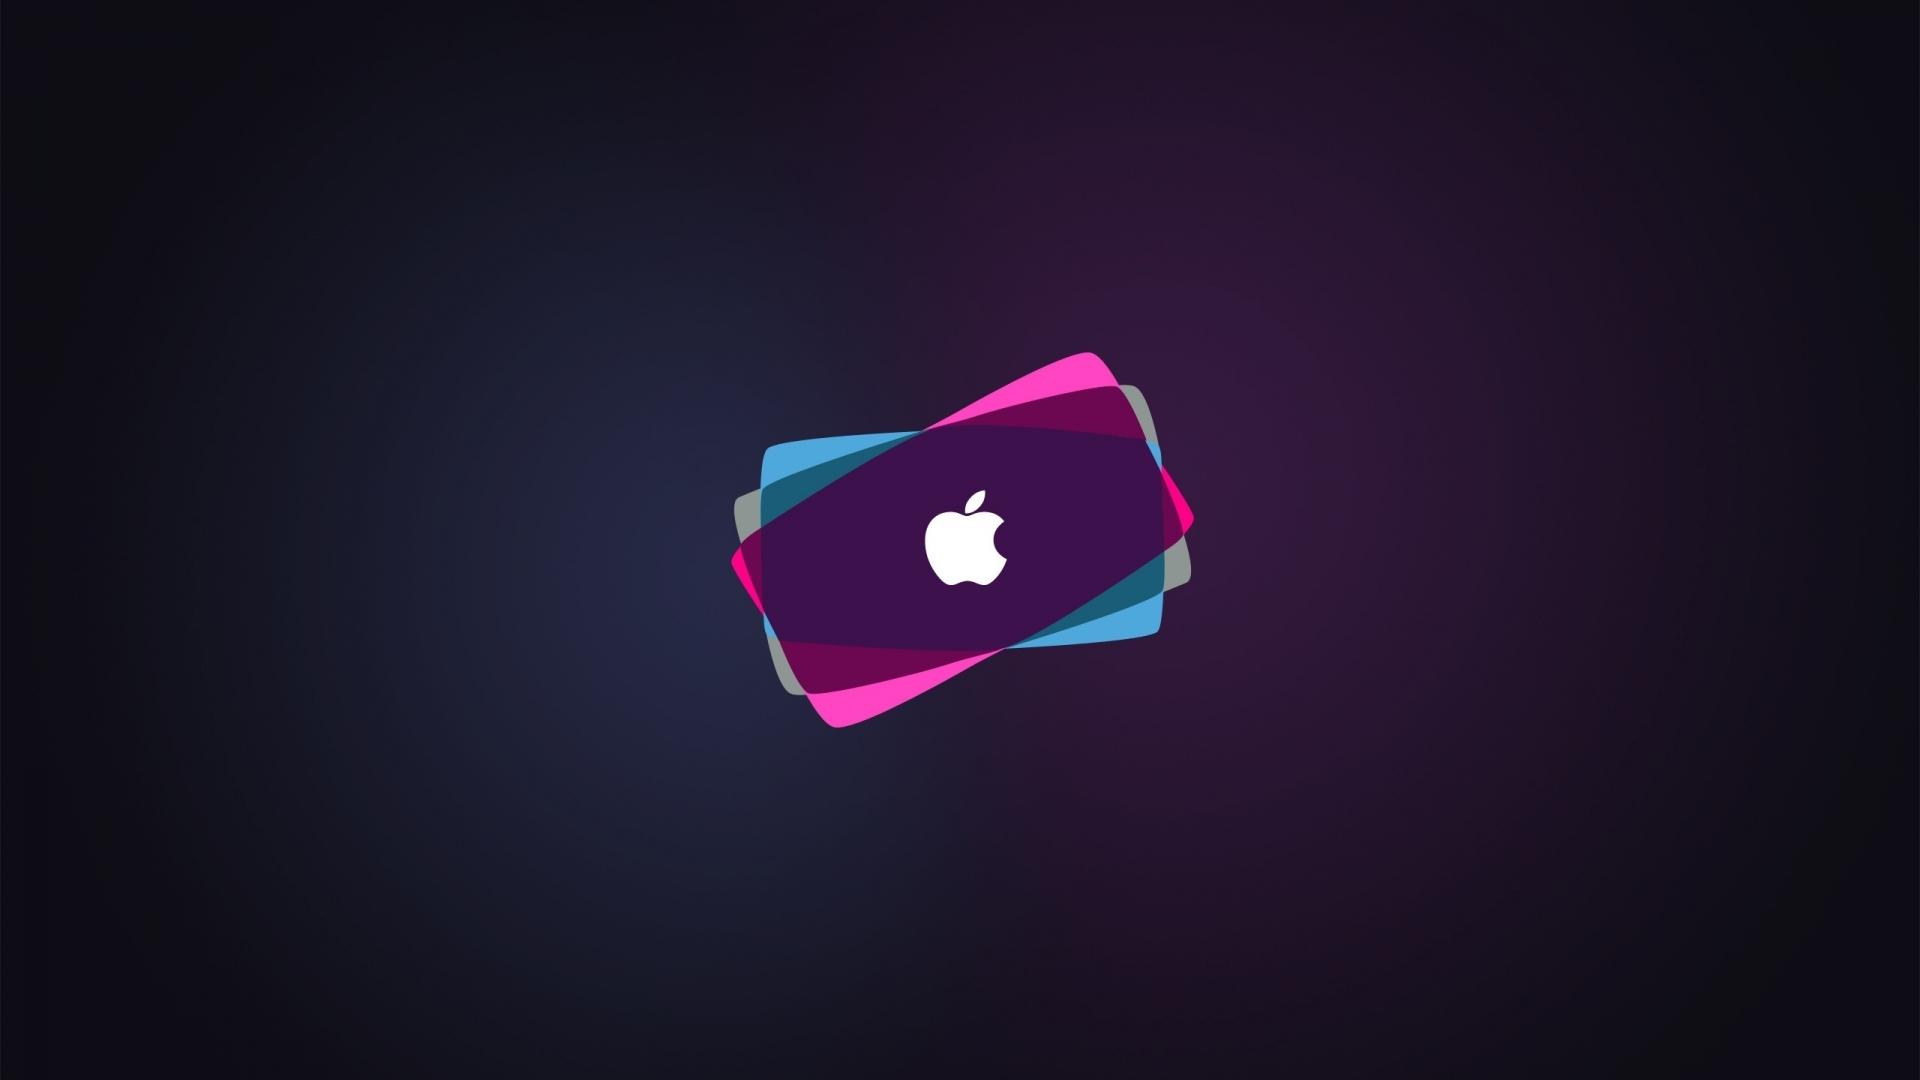 Apple logo wallpaper 3933 1920x1080